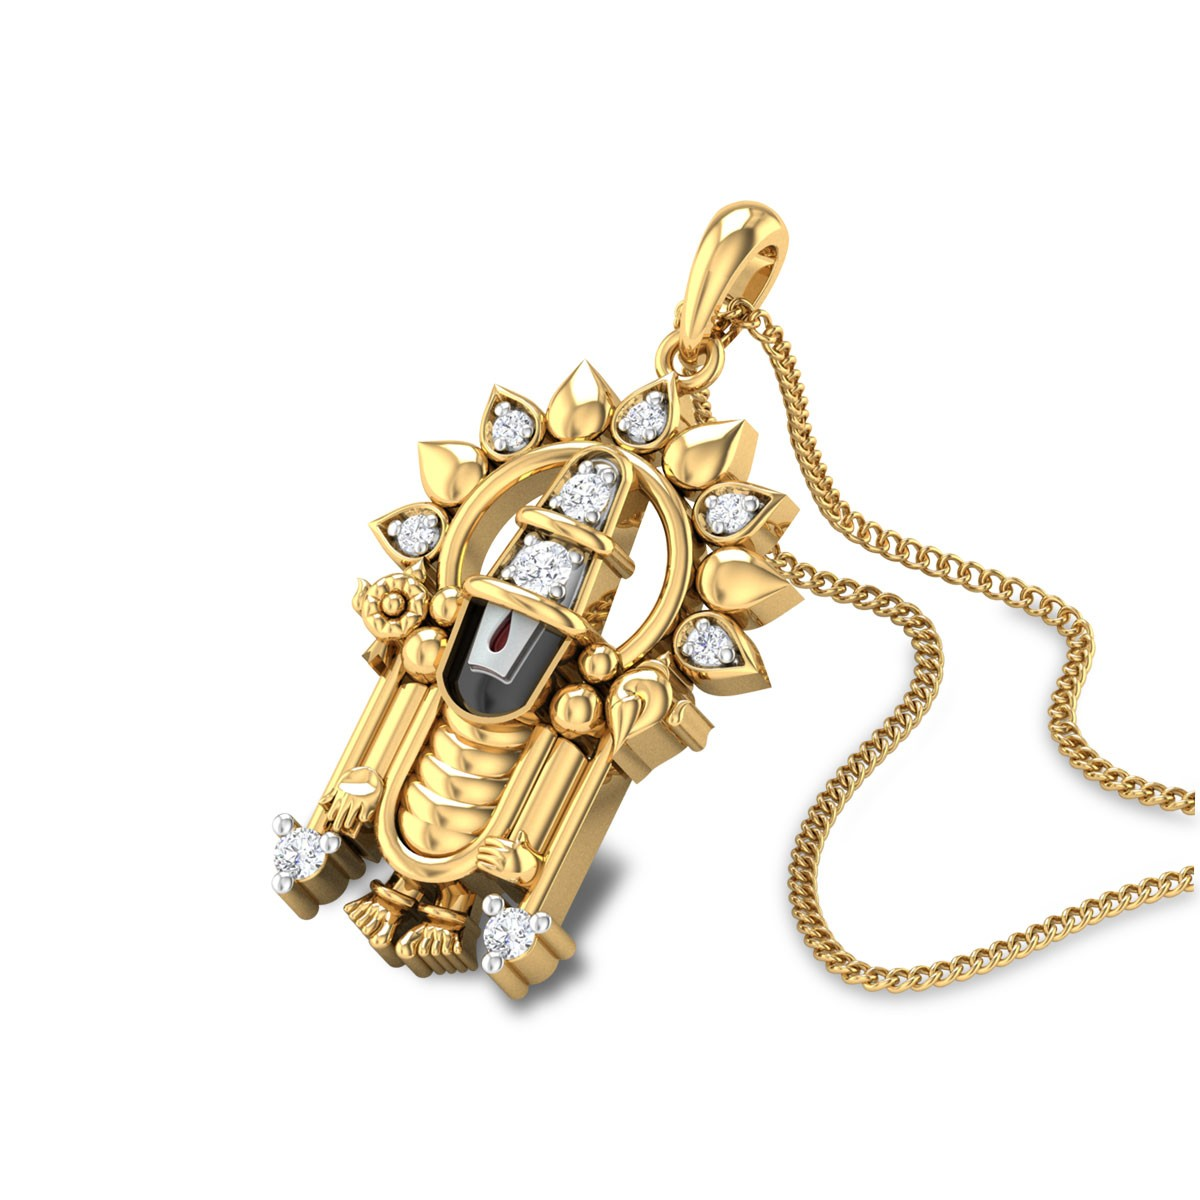 Chalapathy Diamond Pendant